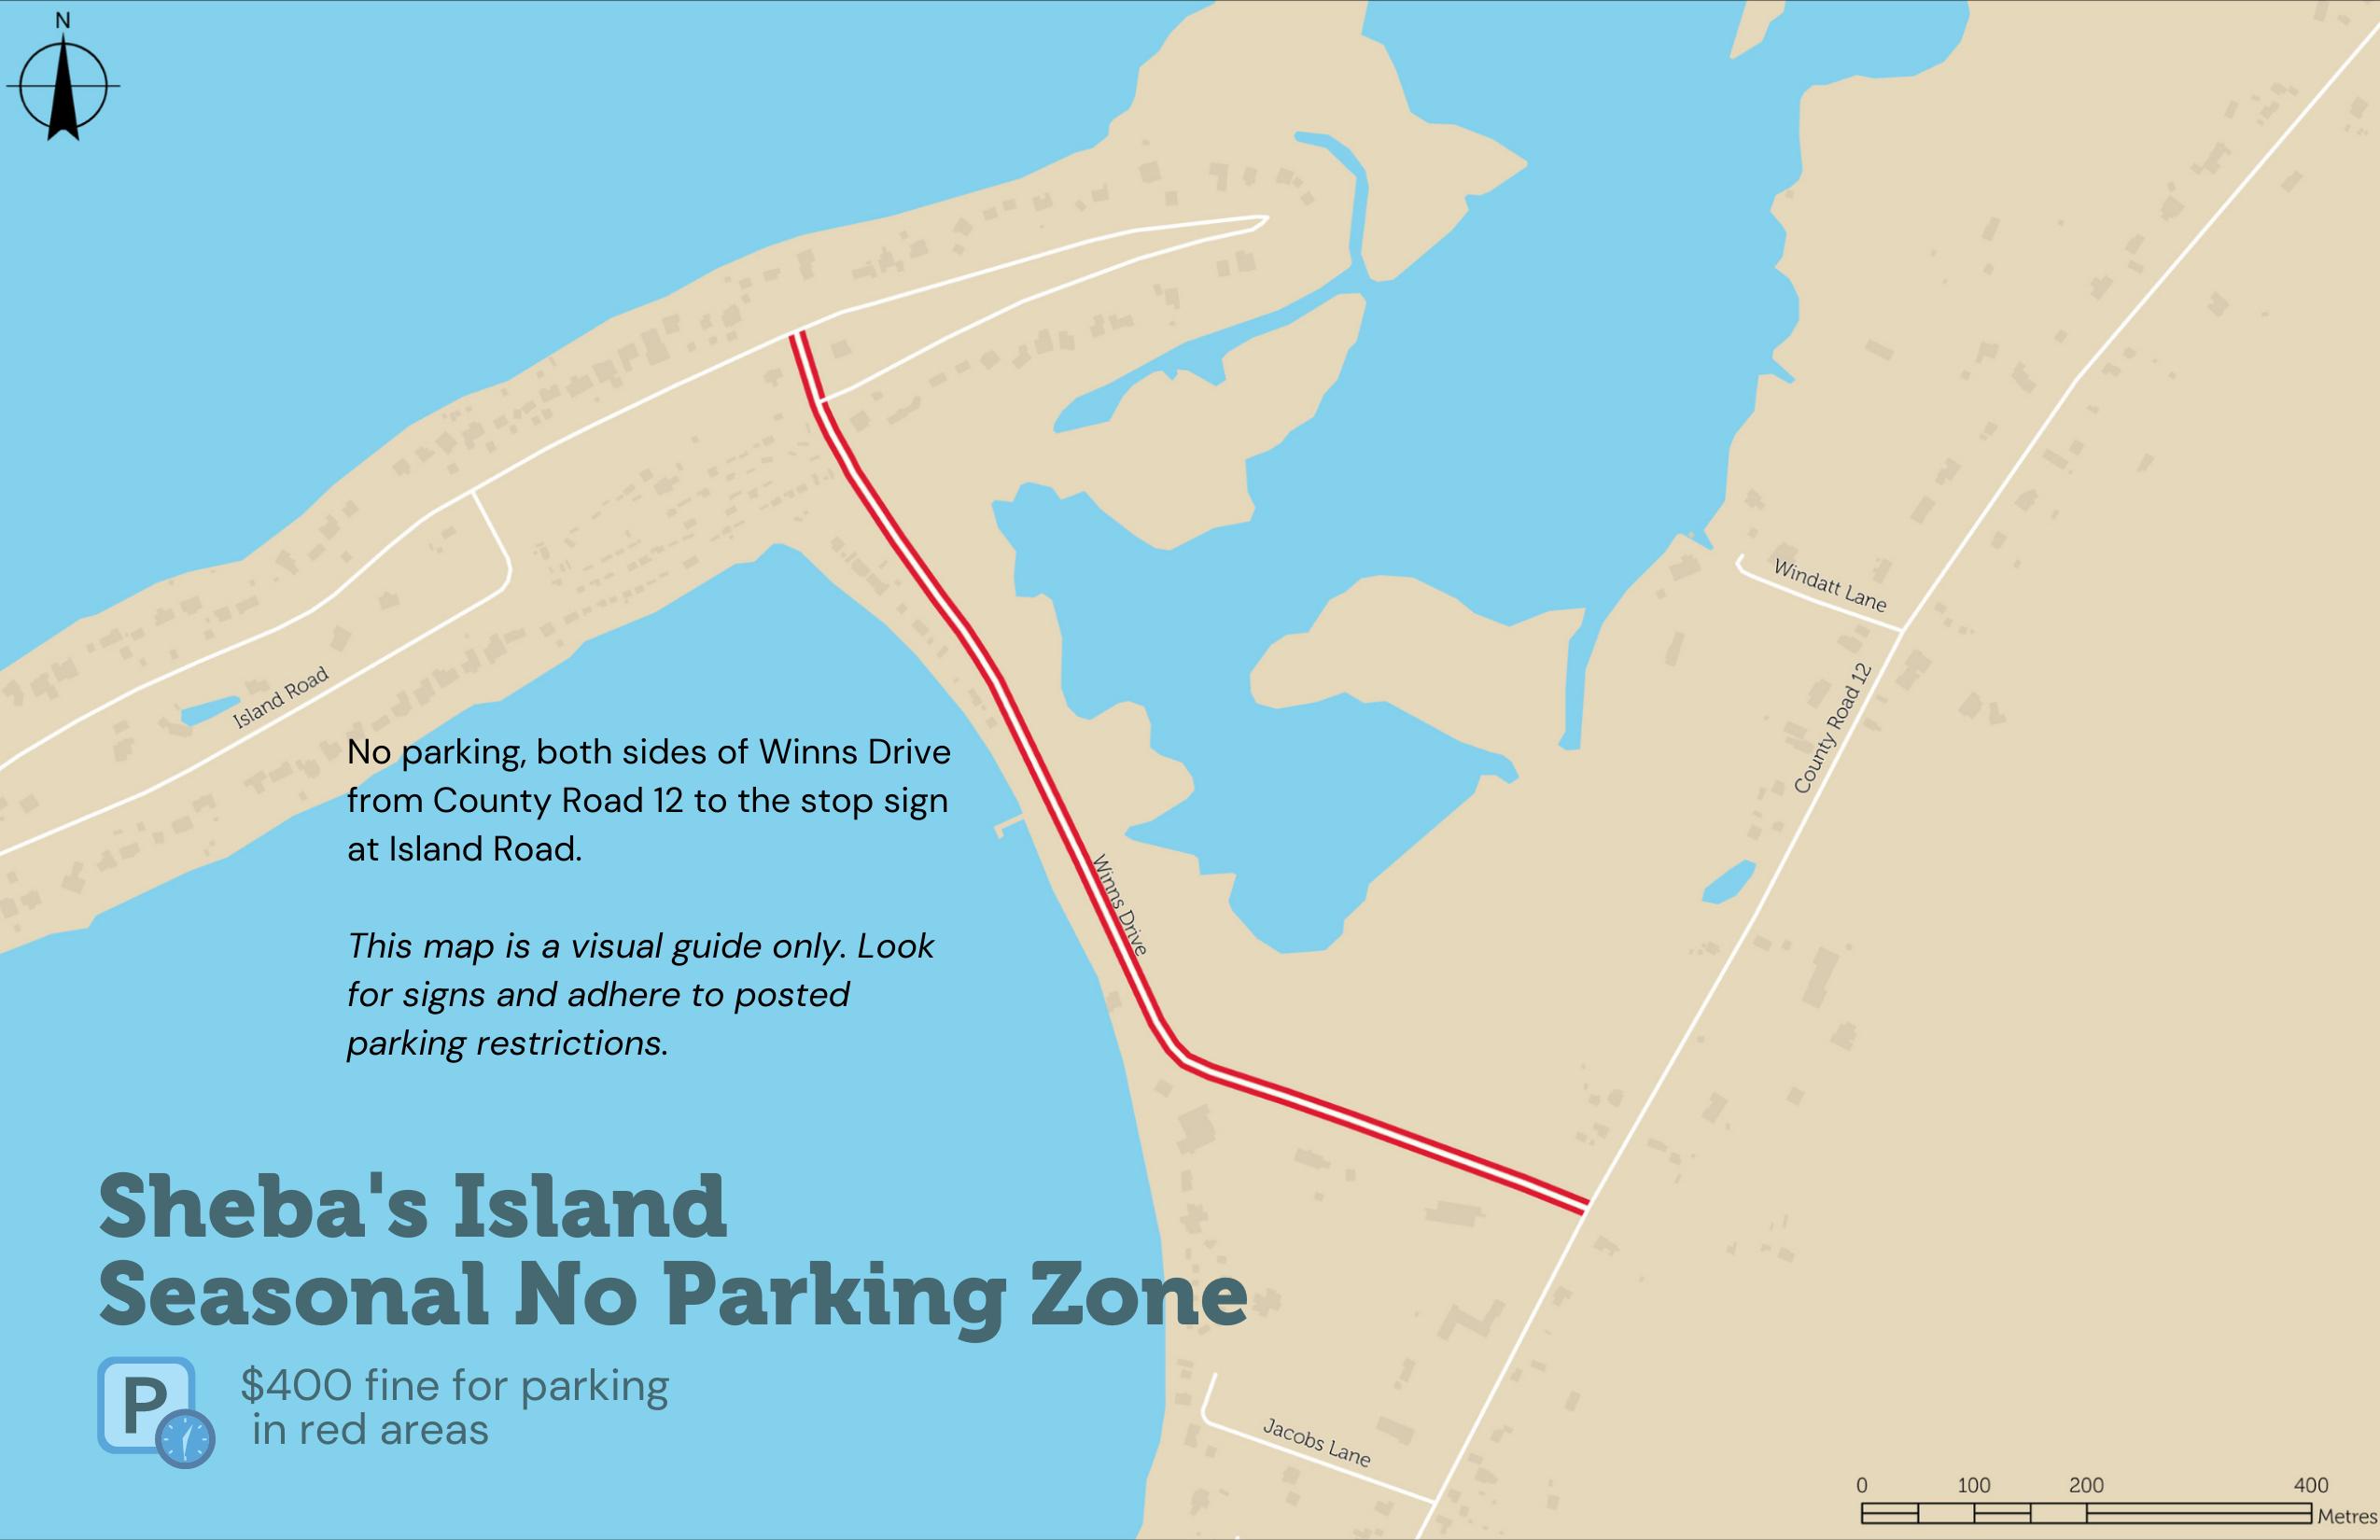 Map depicting the seasonal no parking zone along Winn's Drive heading to Sheba's Island.